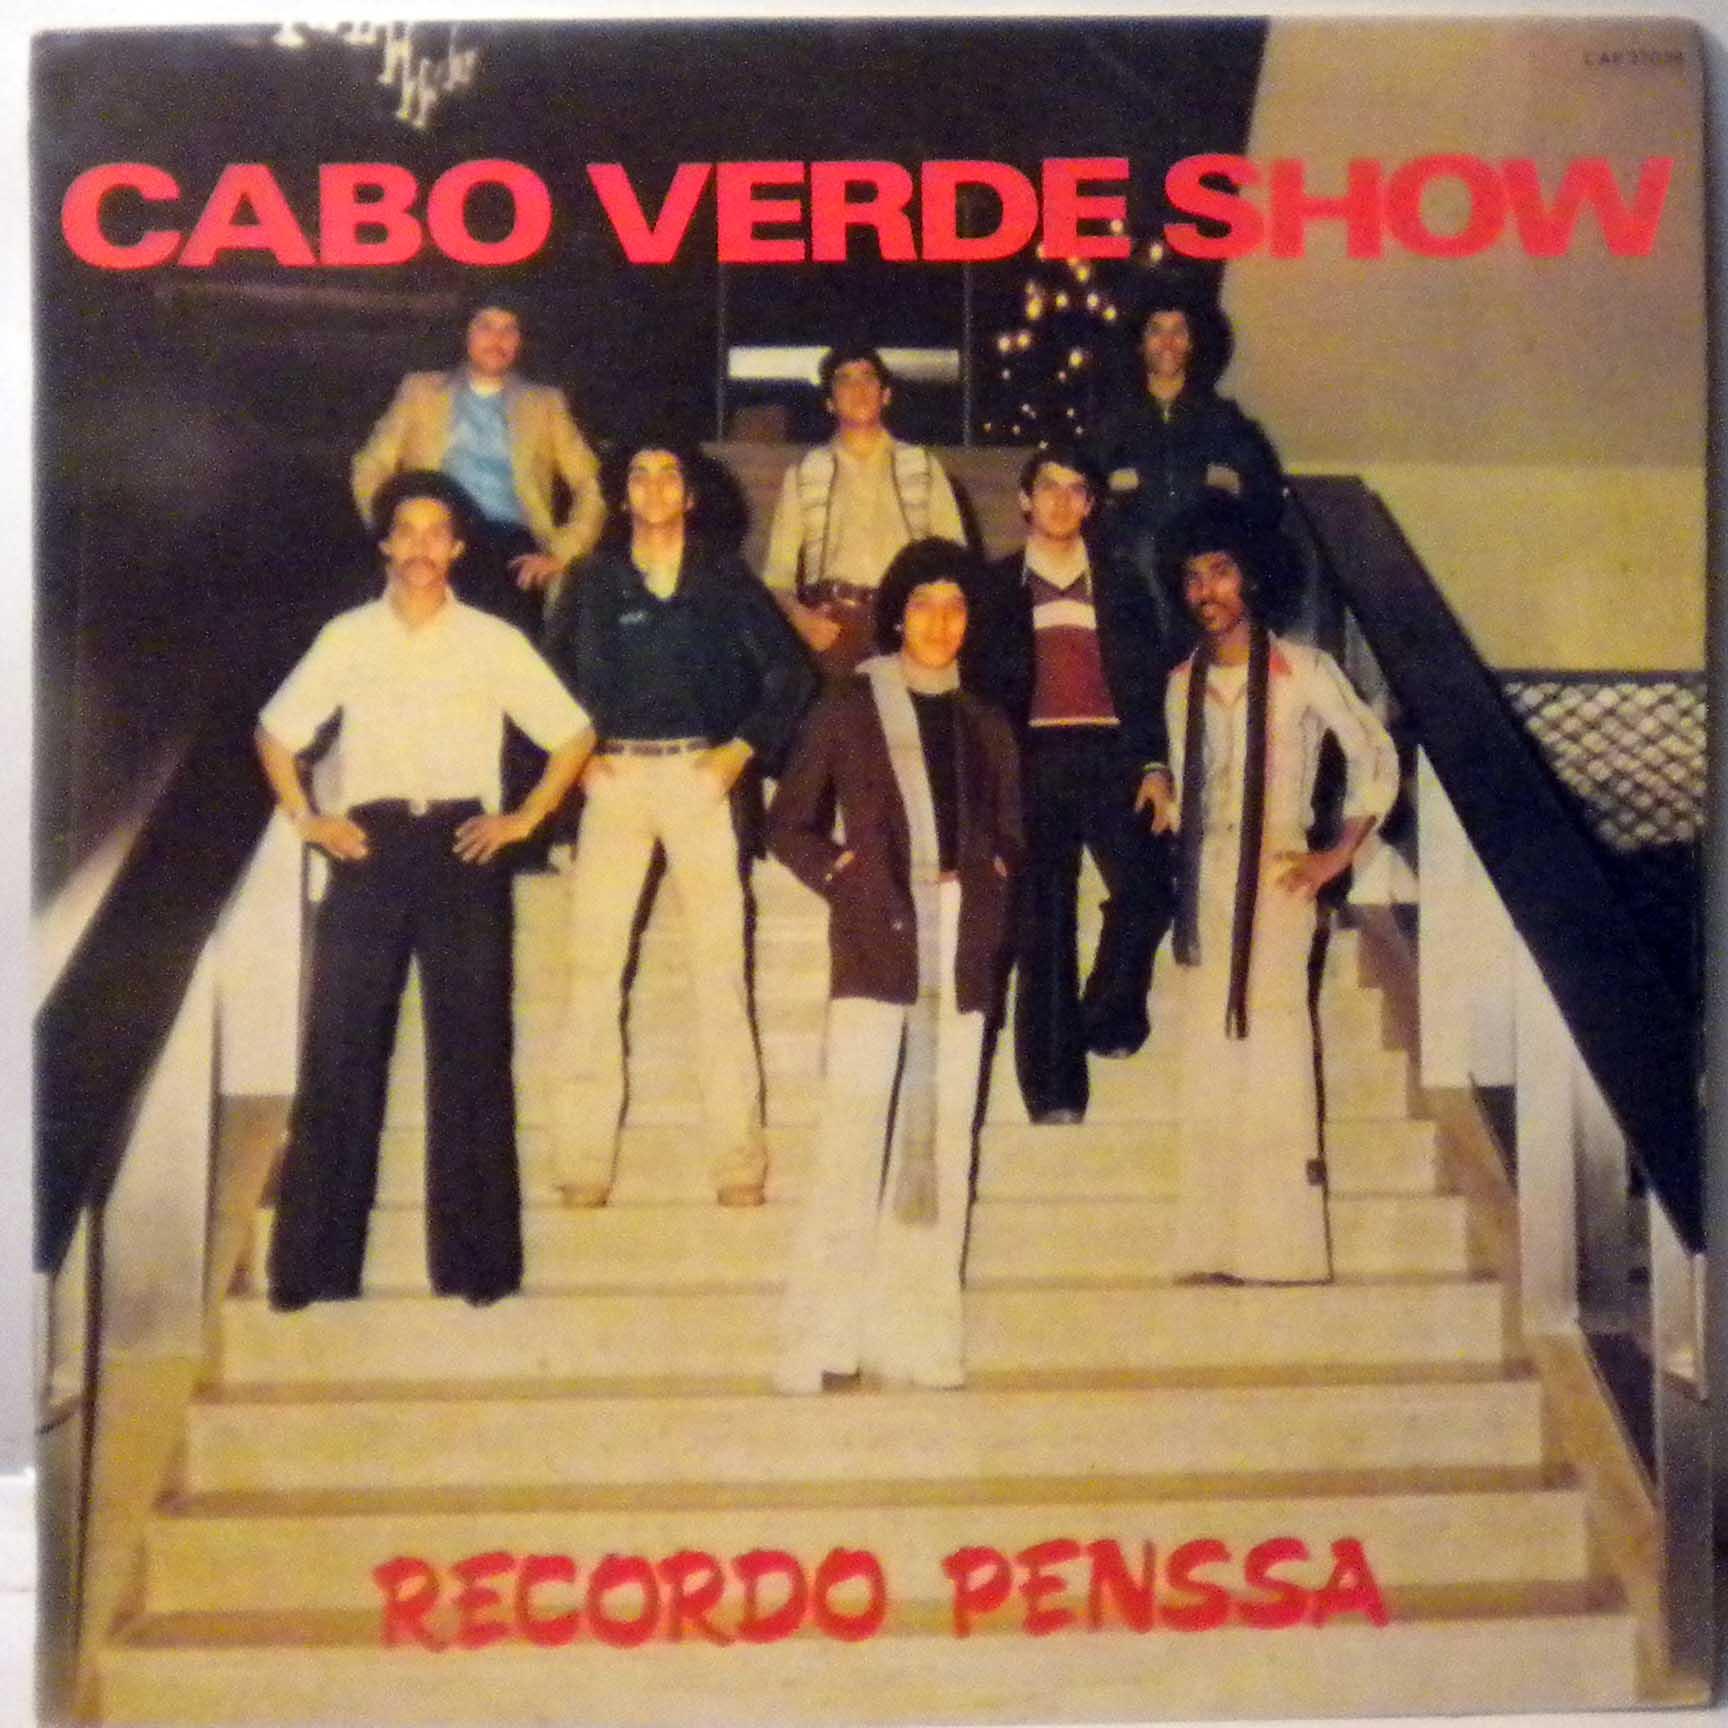 CABO VERDE SHOW - Recordo penssa - LP